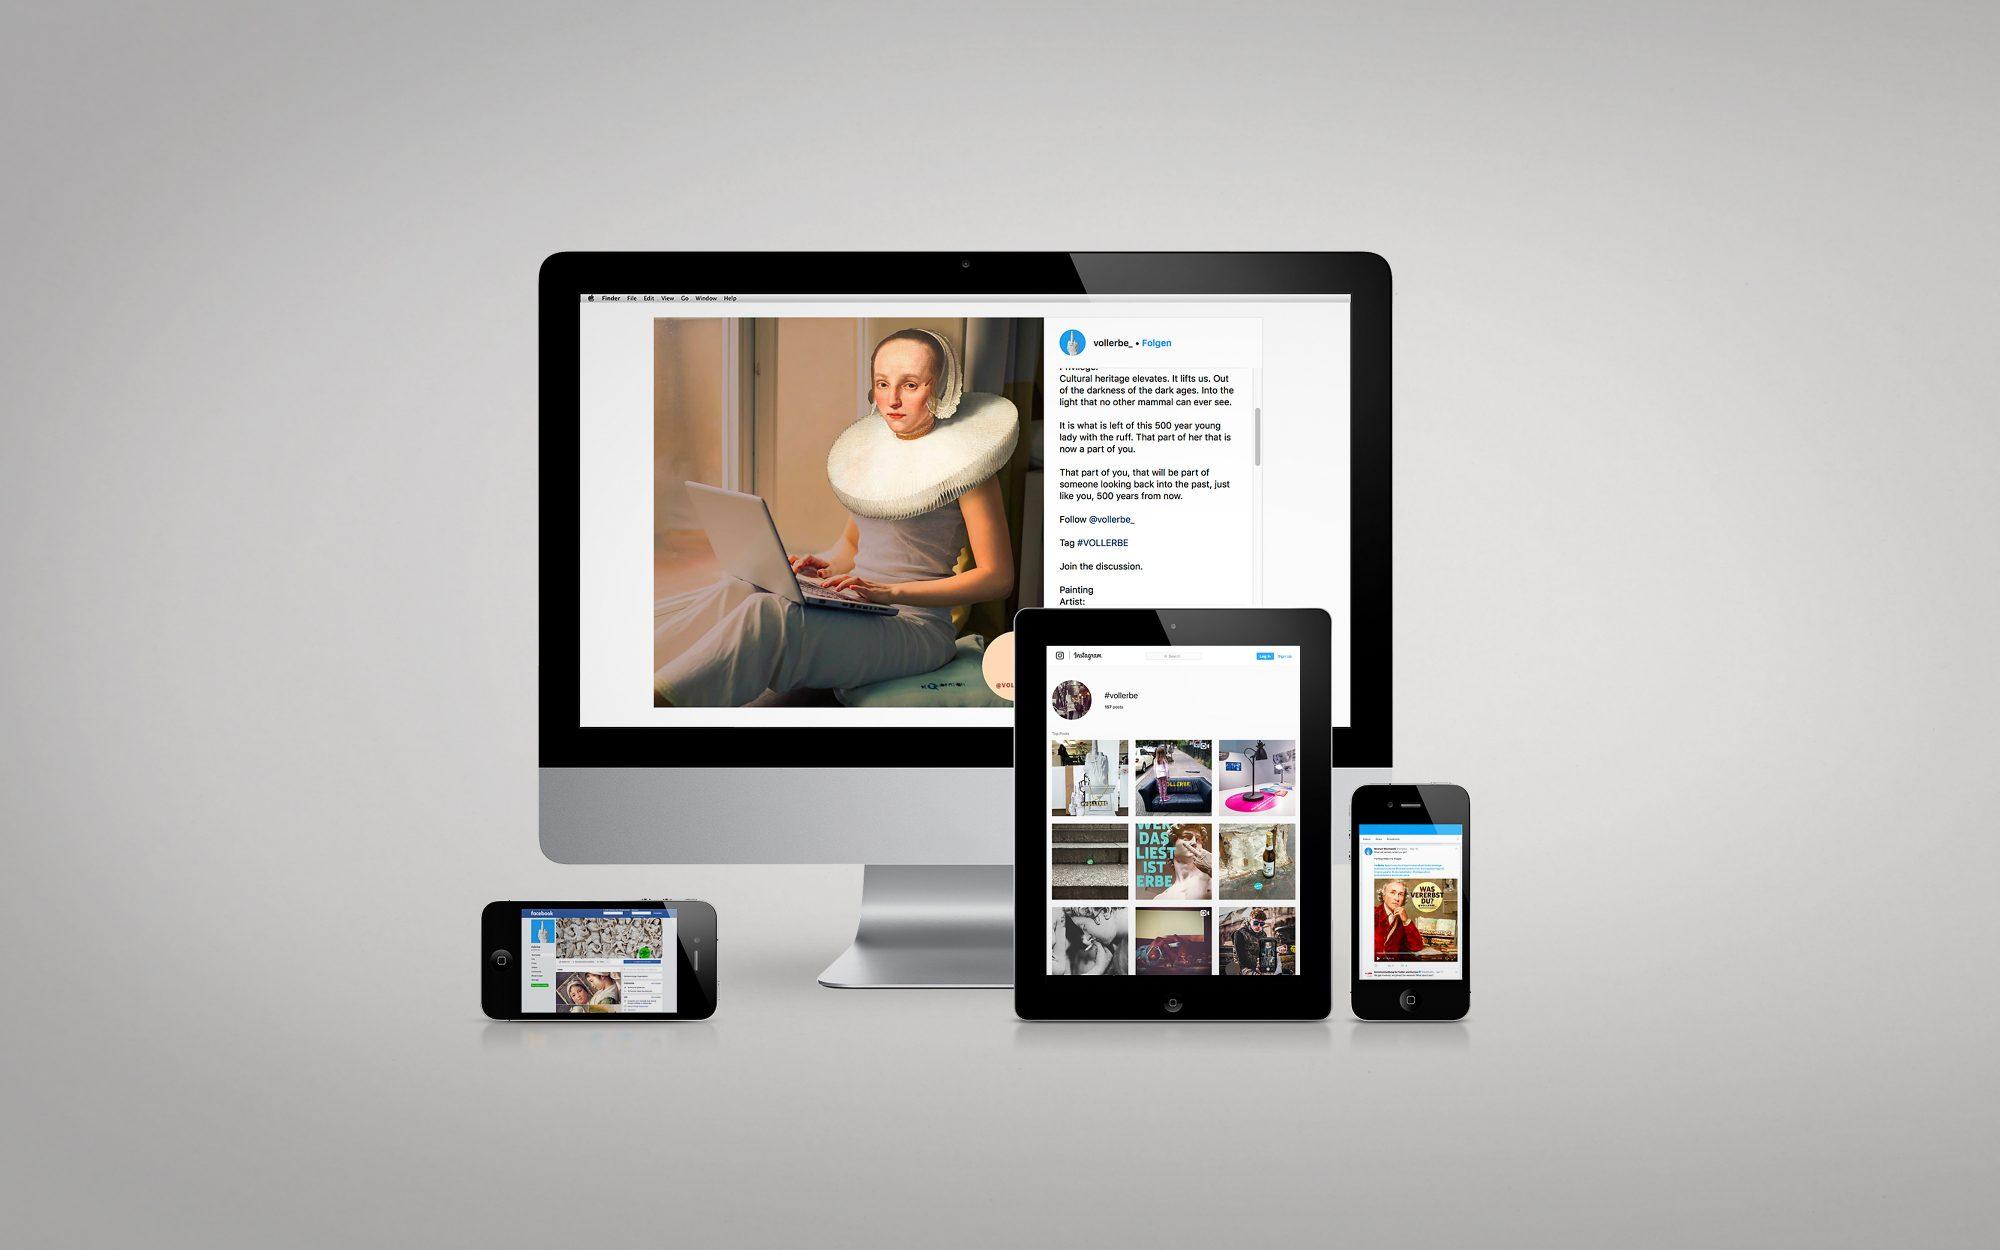 GRACO-Sharing-Heritage-Social-Media-Responsive-2